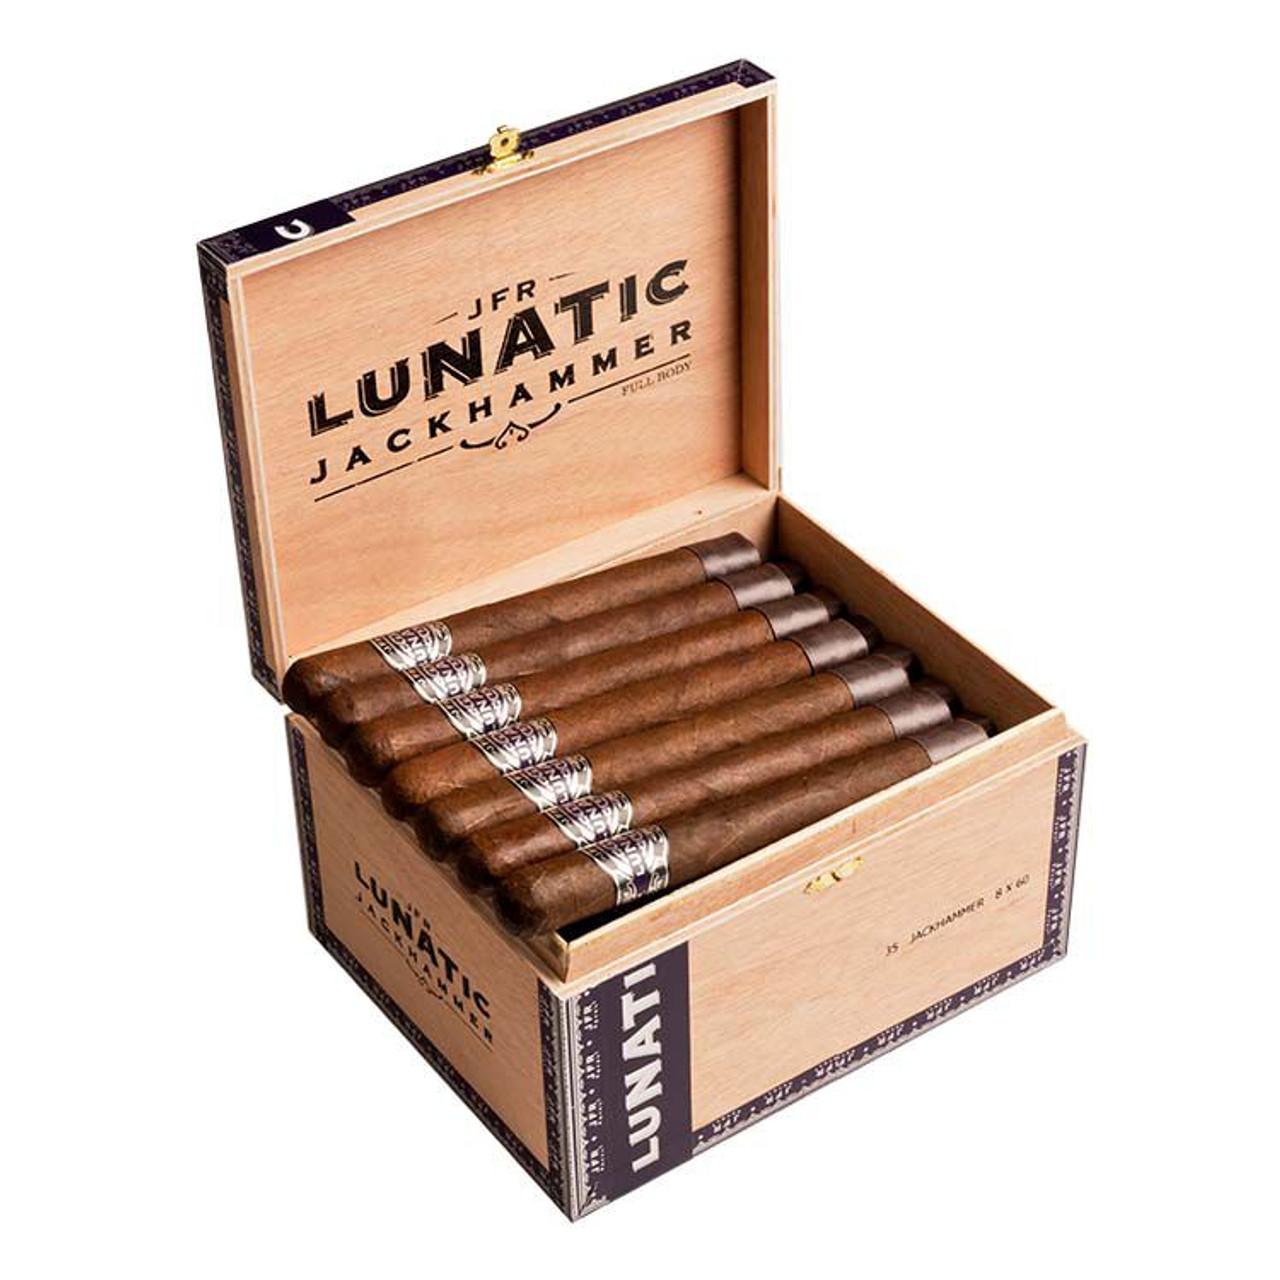 Casa Fernandez Lunatic Jackhammer Cigars - 8 x 60 (Box of 35)